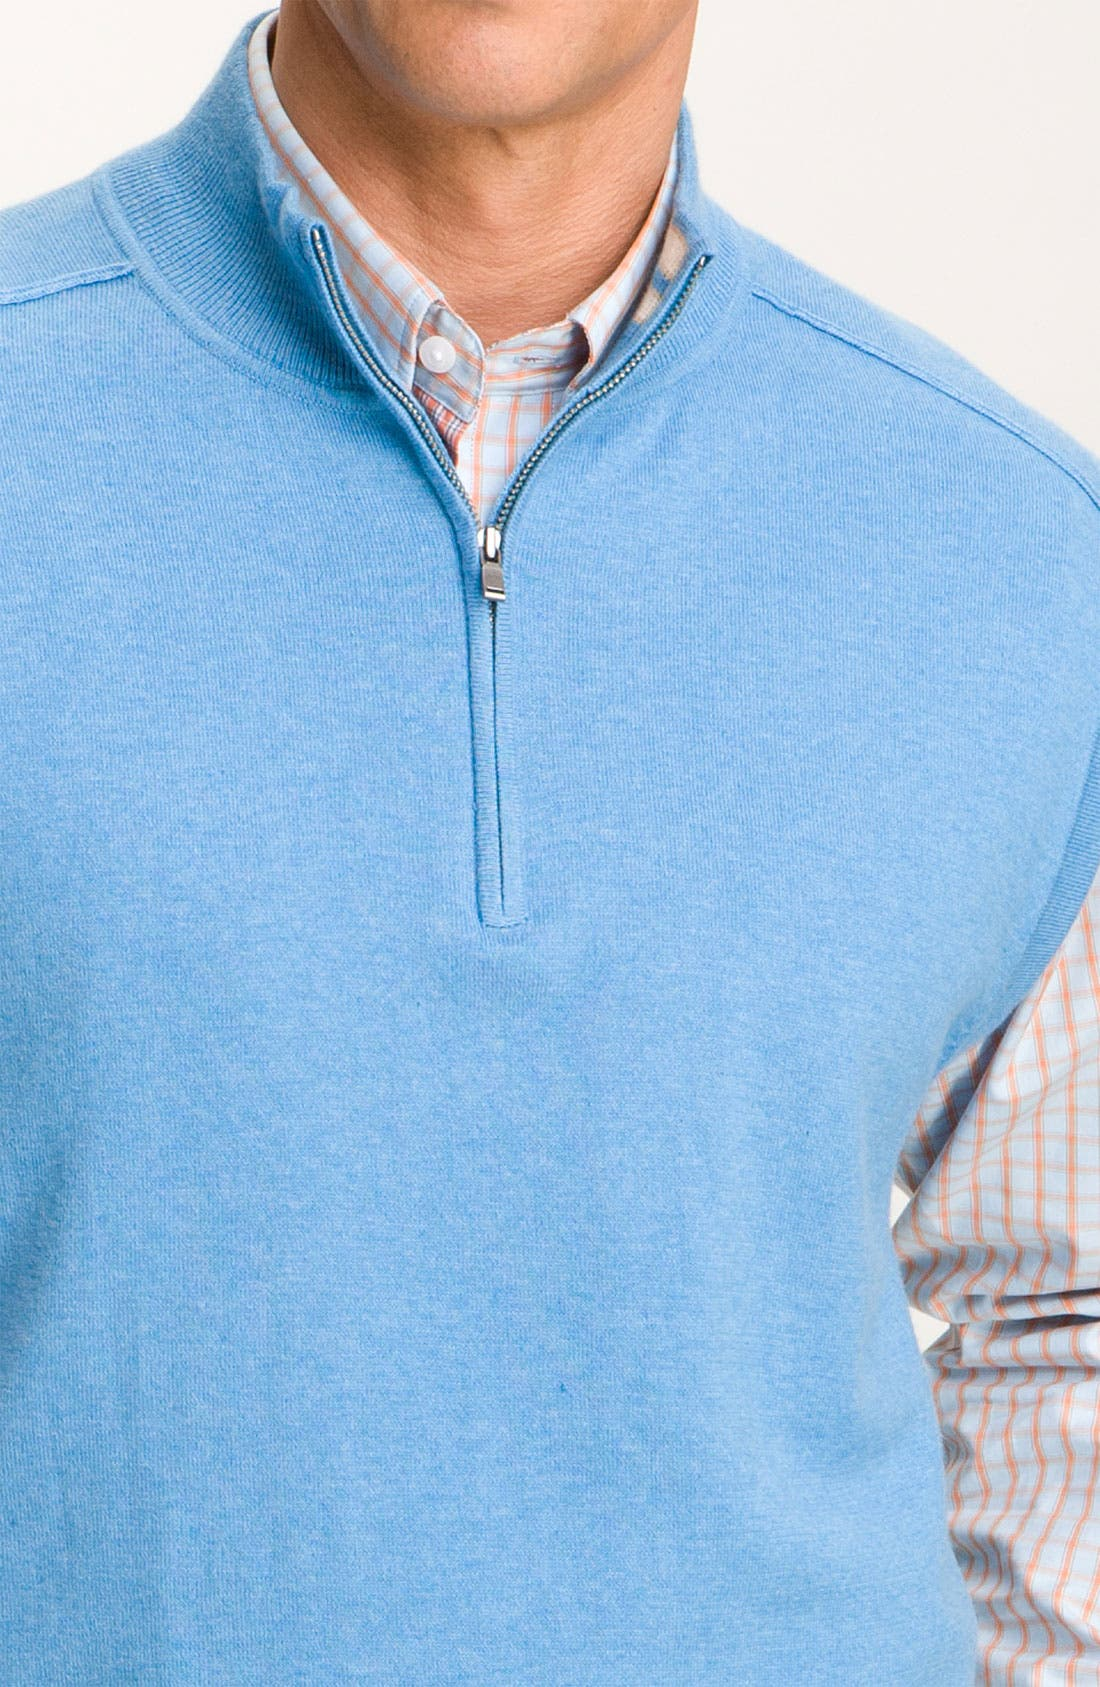 Alternate Image 3  - Cutter & Buck 'Thomas' Half Zip Vest (Big & Tall) (Online Exclusive)